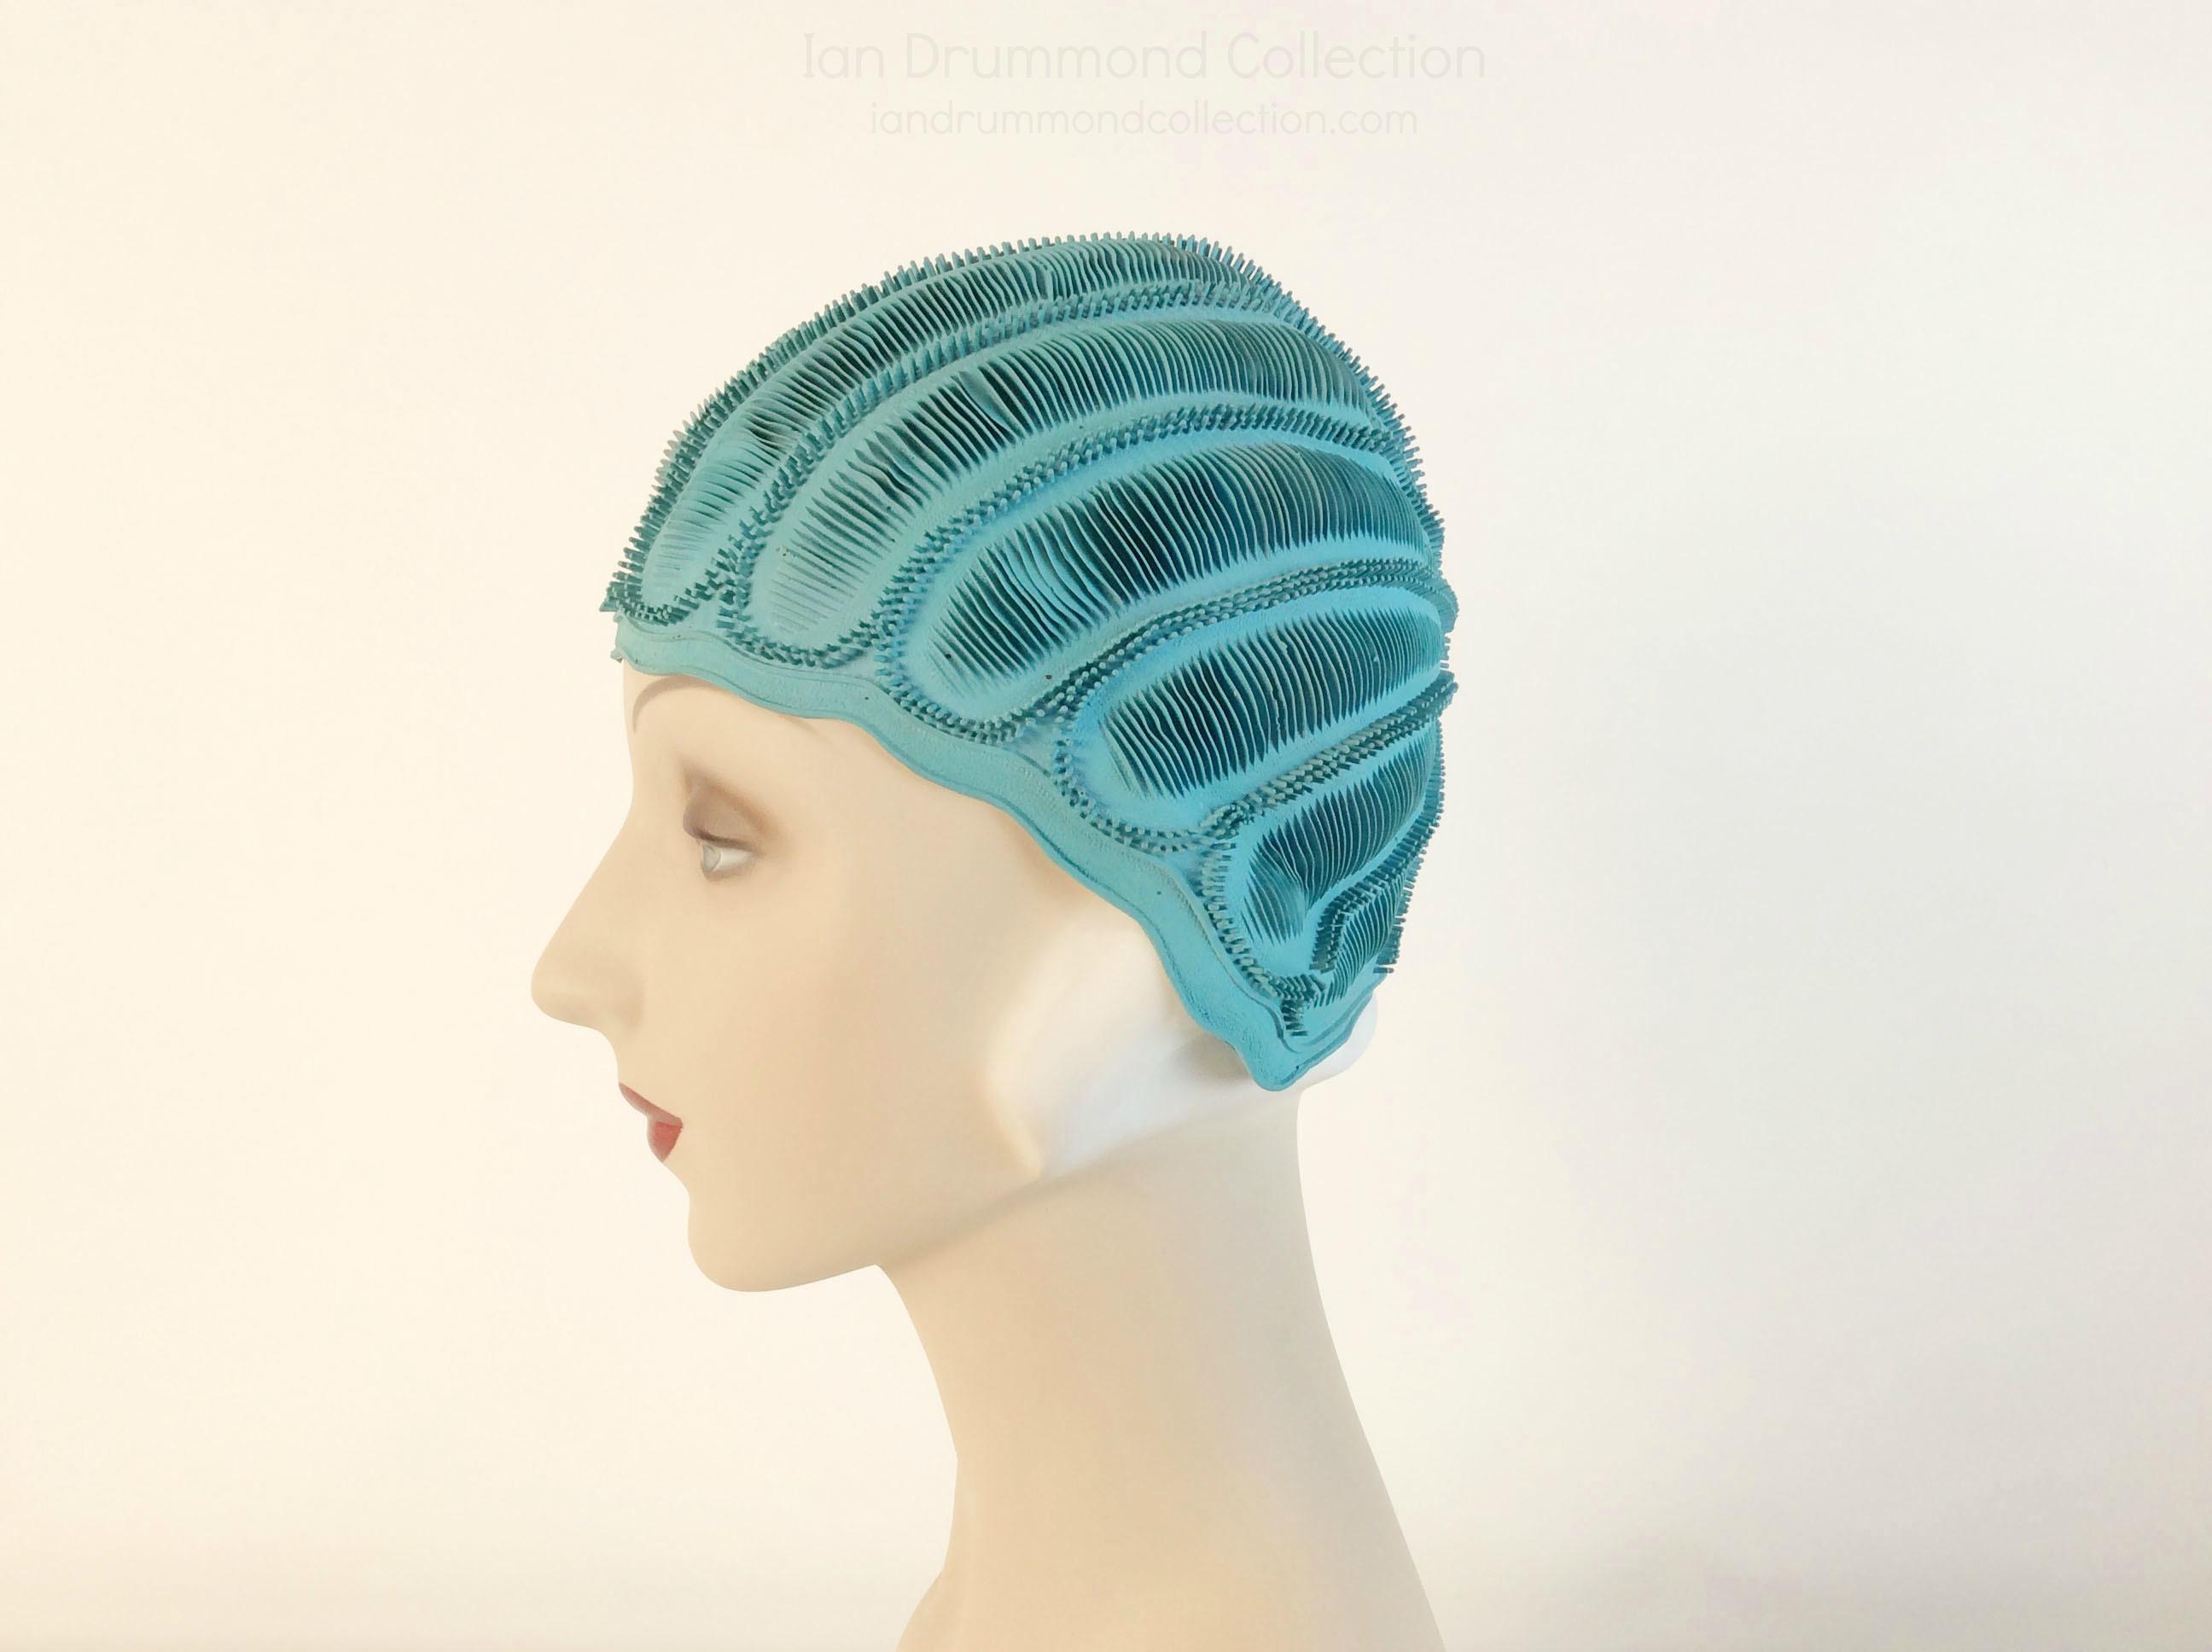 IDC Movie Wardrobe Rental Swim Cap 2 Turquoise with Scallops and Ridges